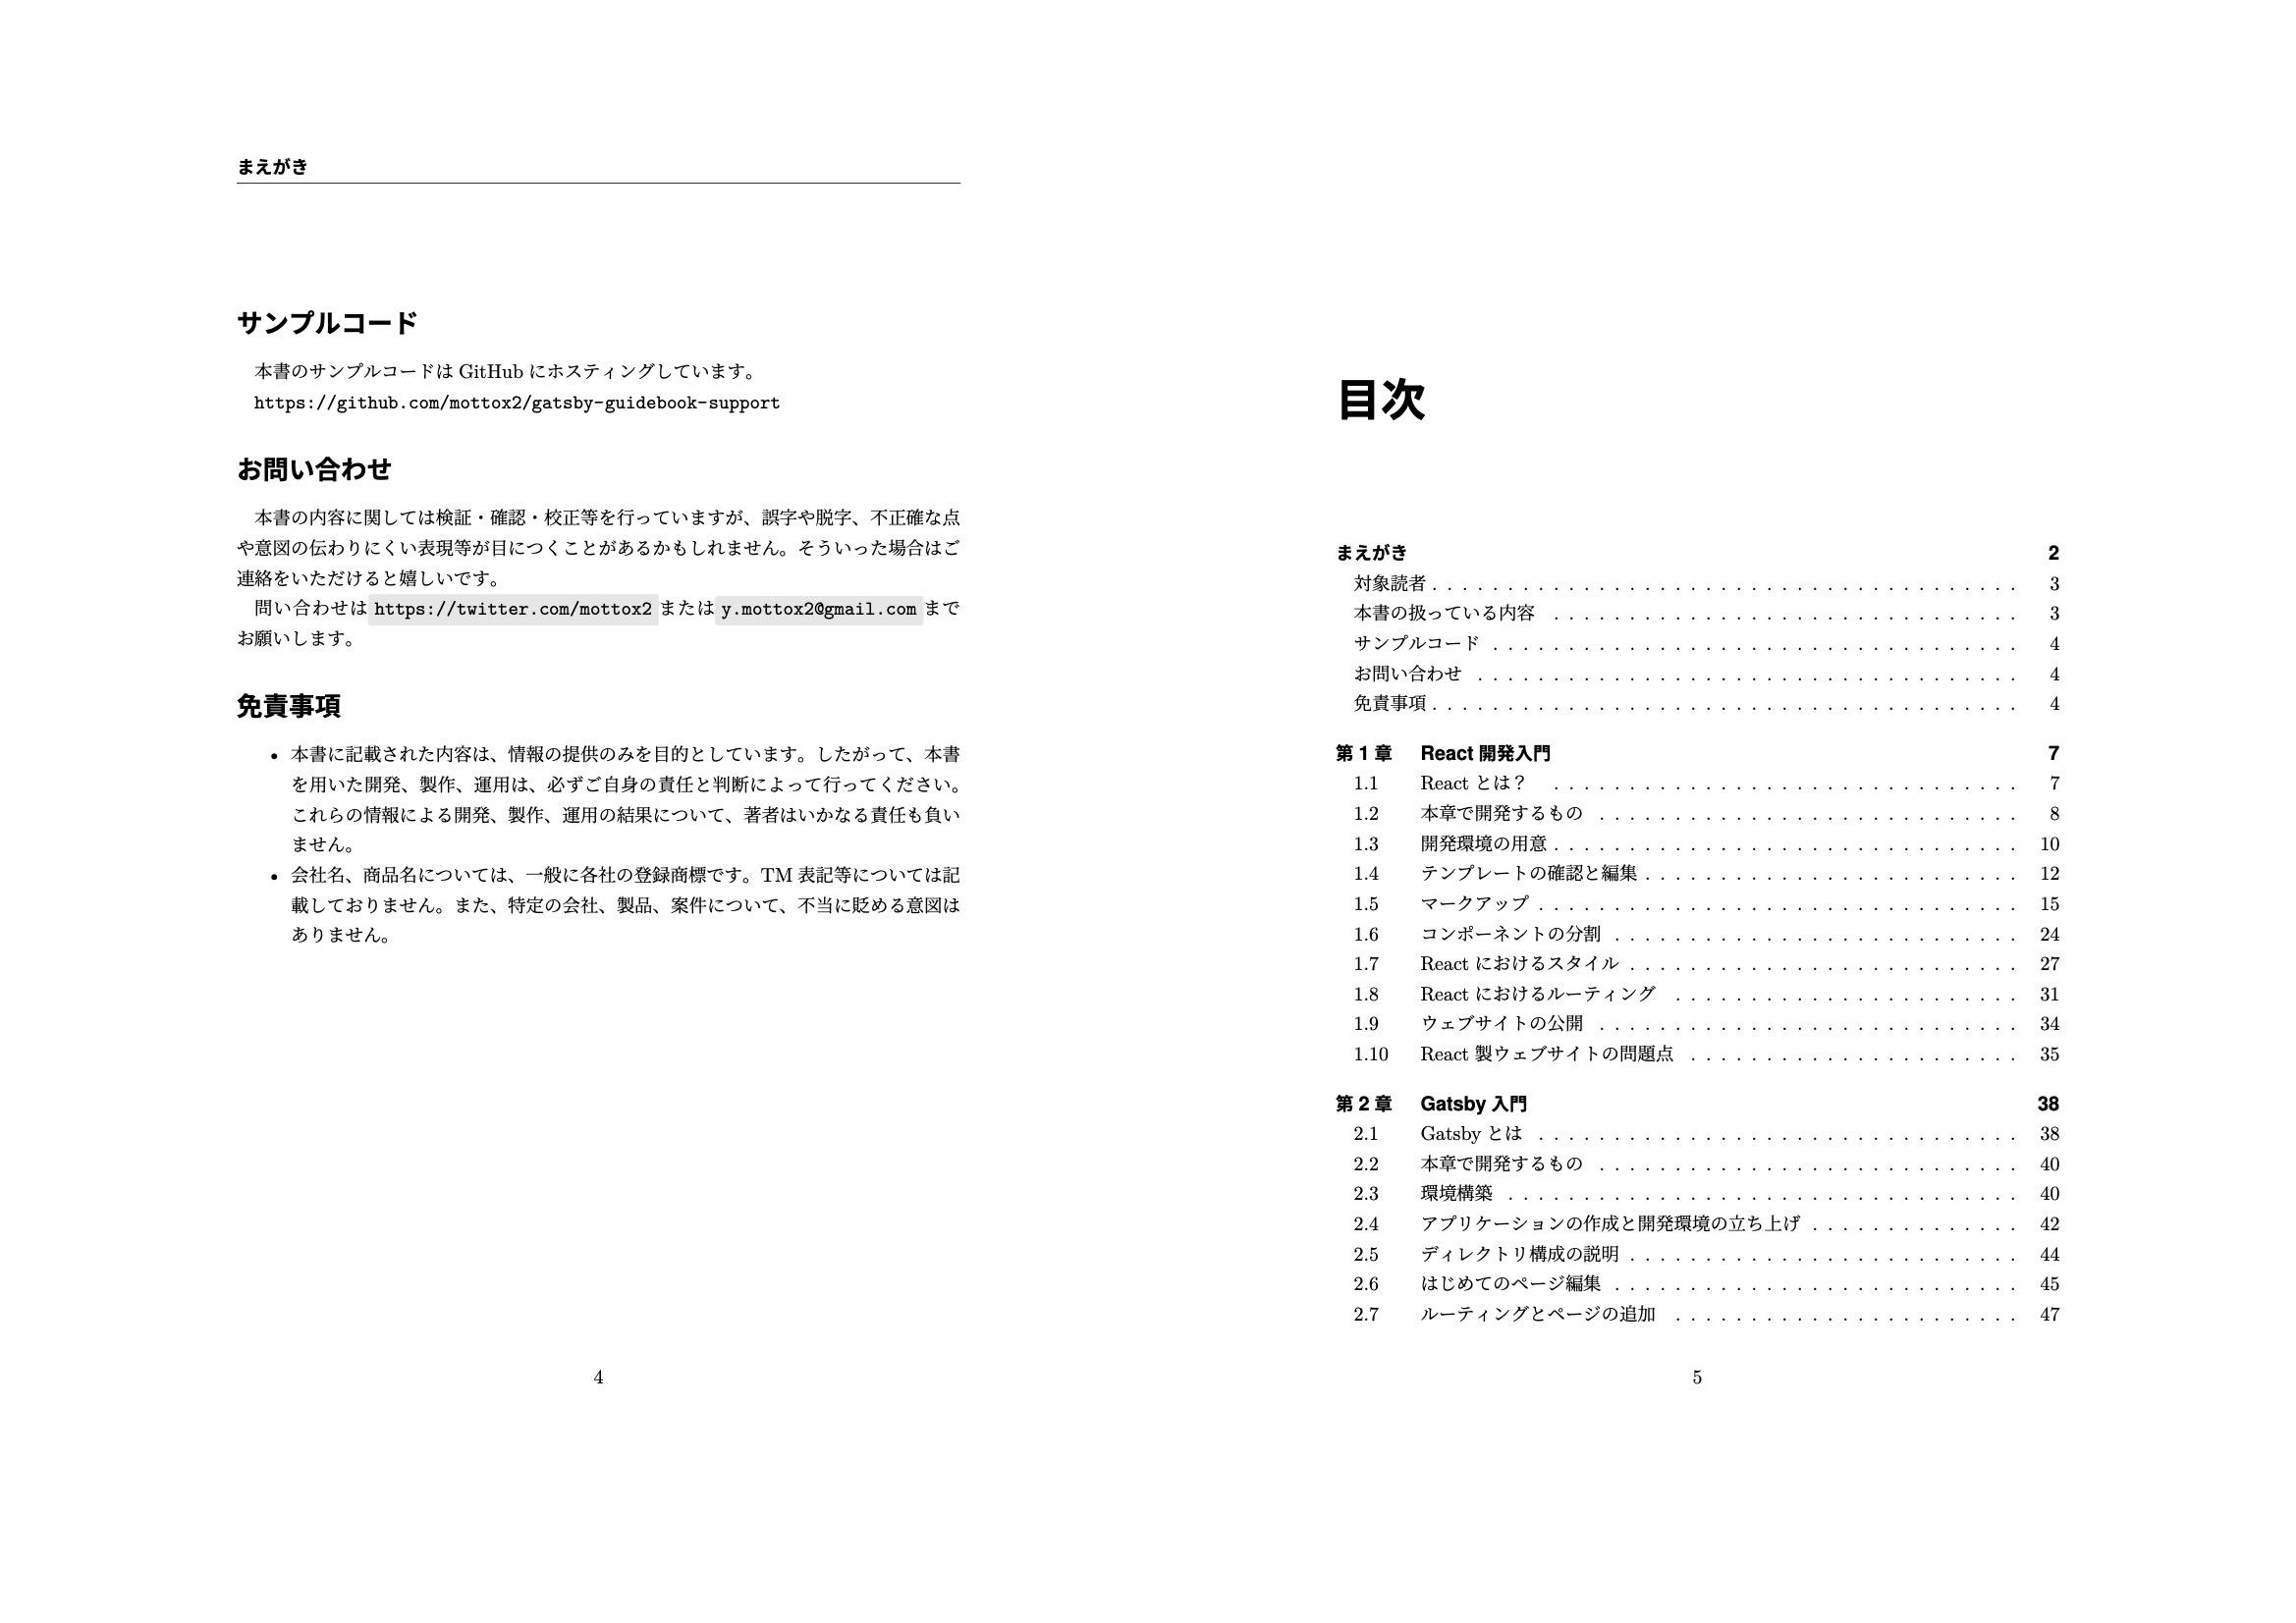 gatsby-guidebook3 2.jpeg (305.3 kB)